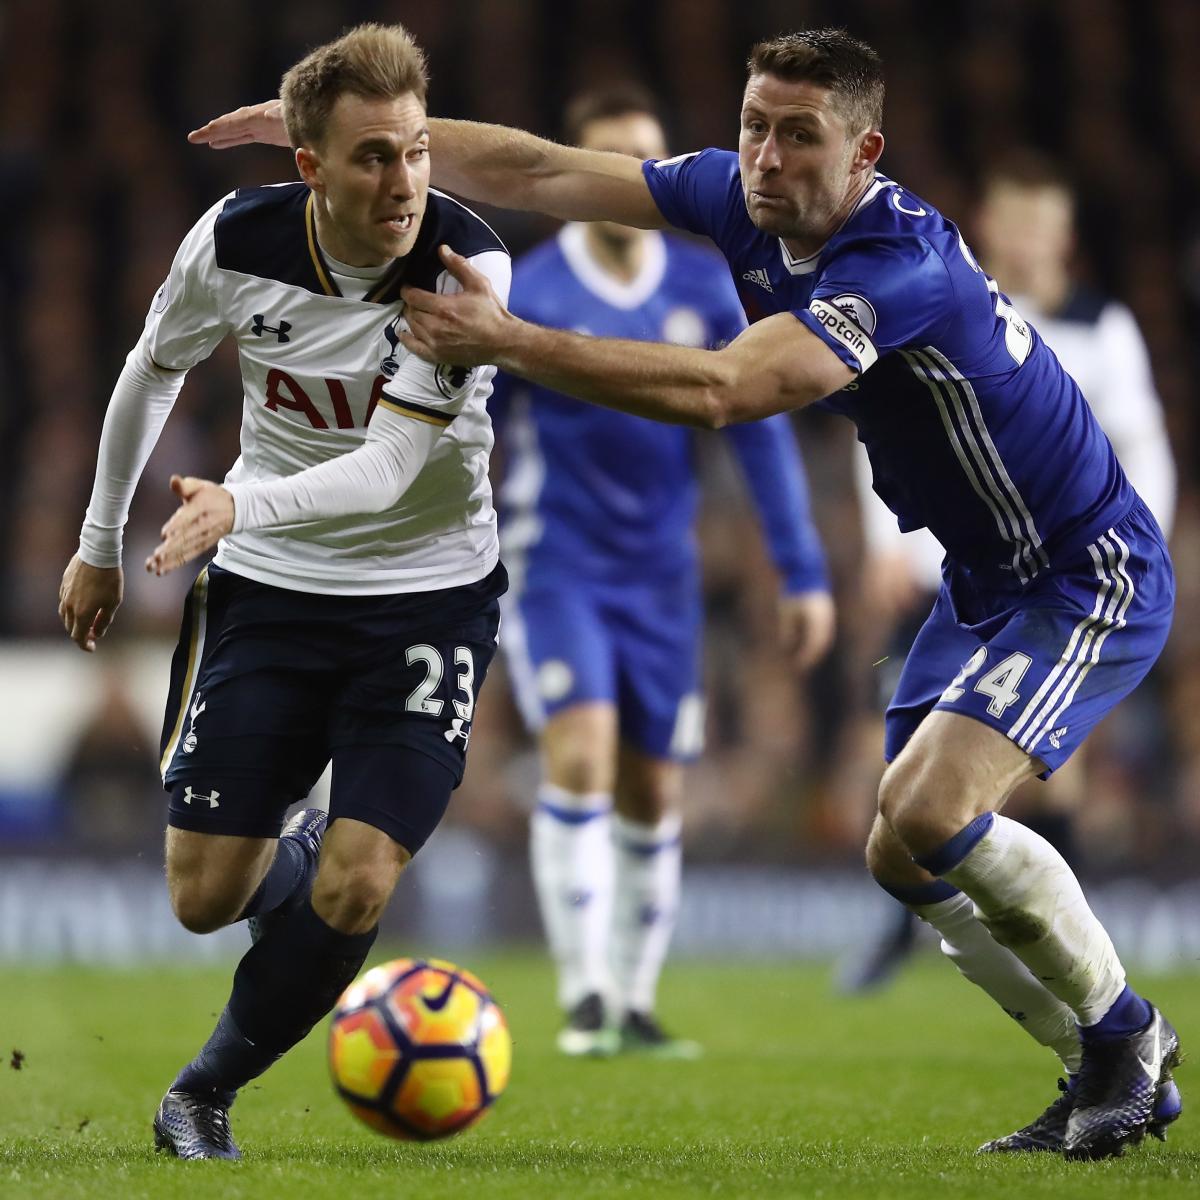 Tottenham Vs Ajax Tickets Away End: Tottenham Vs. Chelsea: Live Score, Highlights From Premier